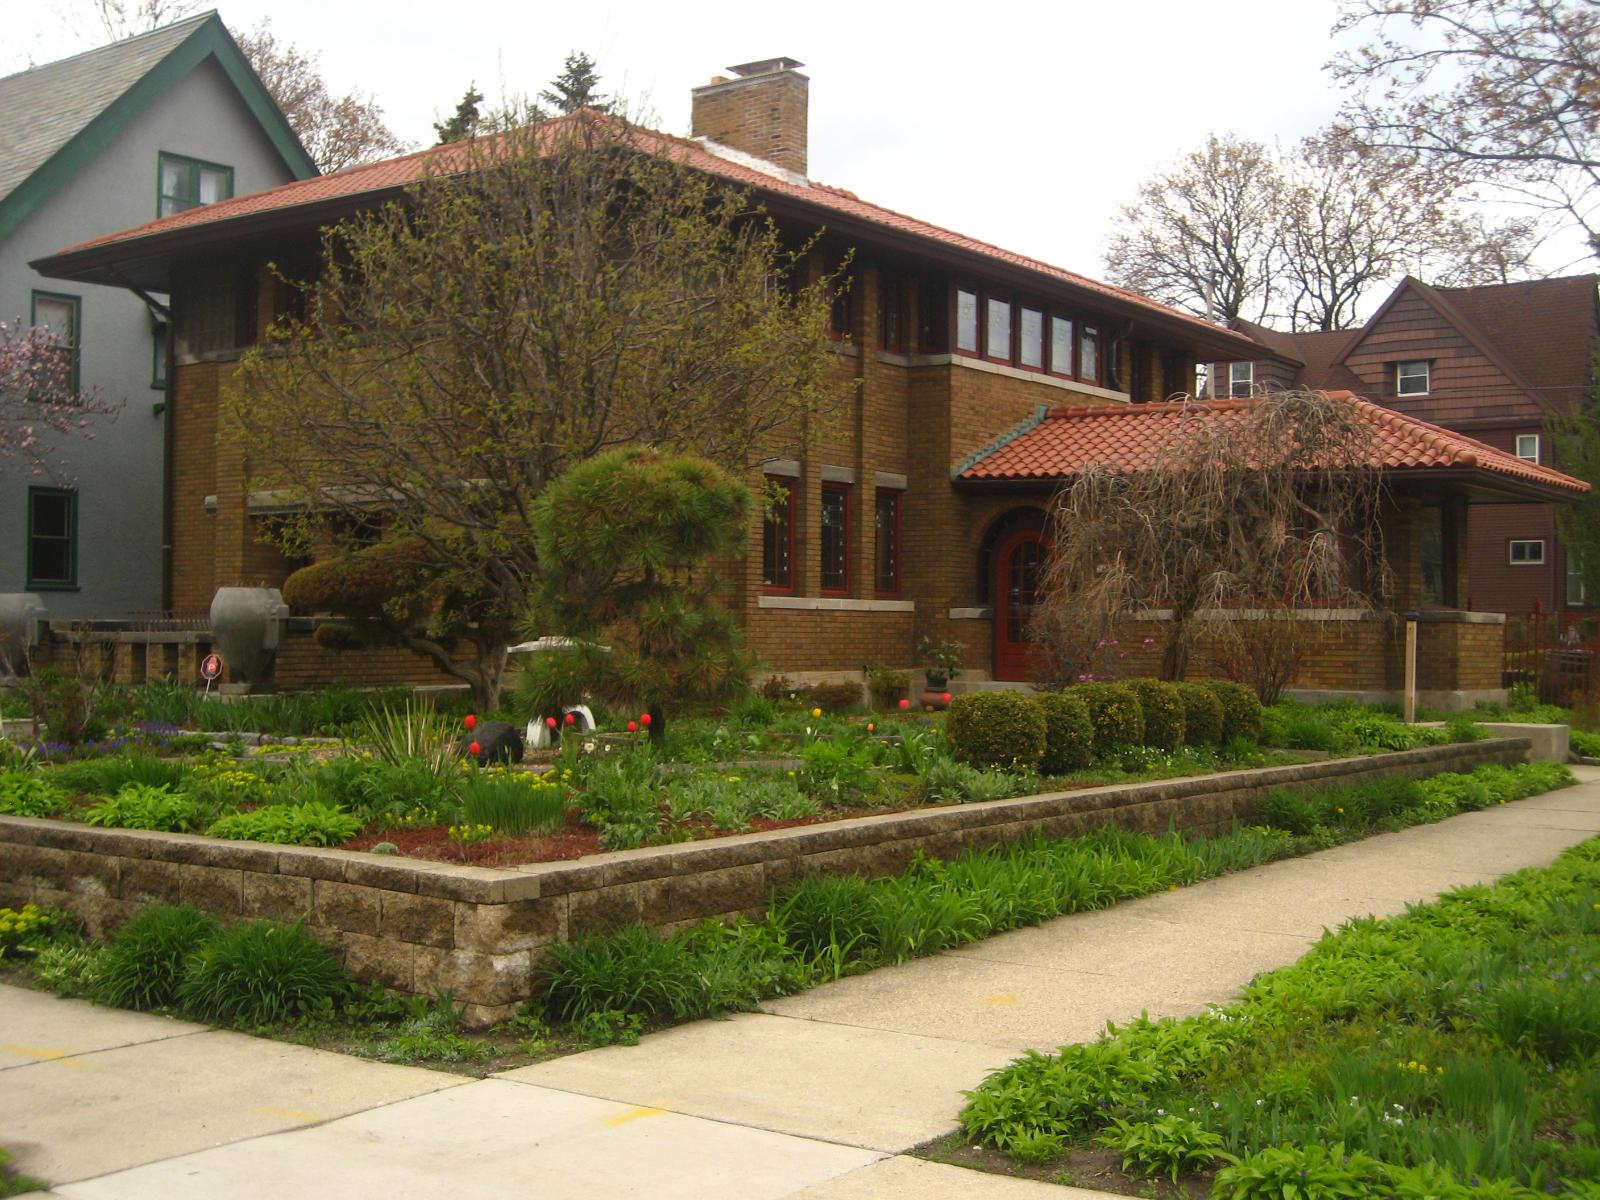 Dr. Thomas Robinson Bours House